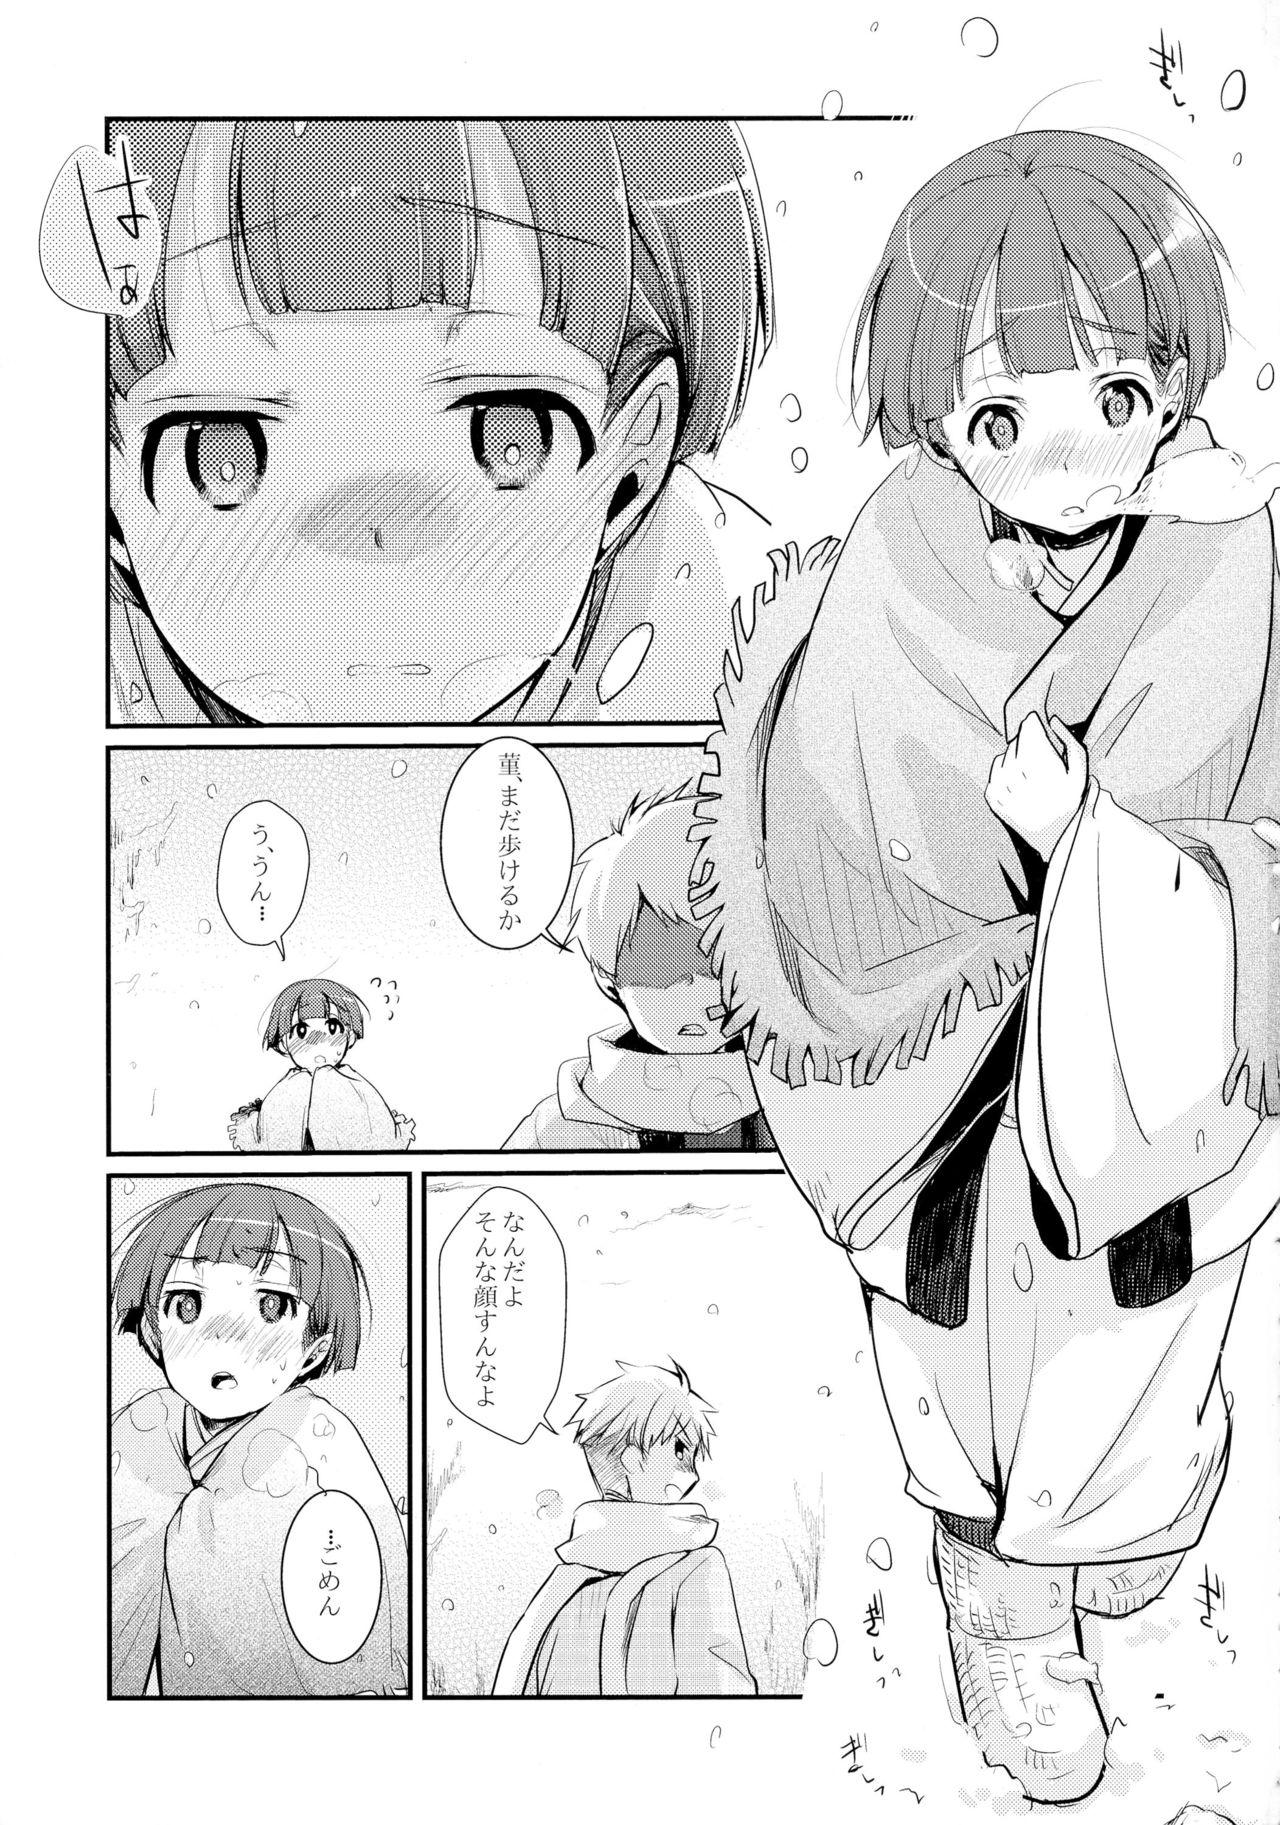 Kakeochi Shoujo Netorare 2